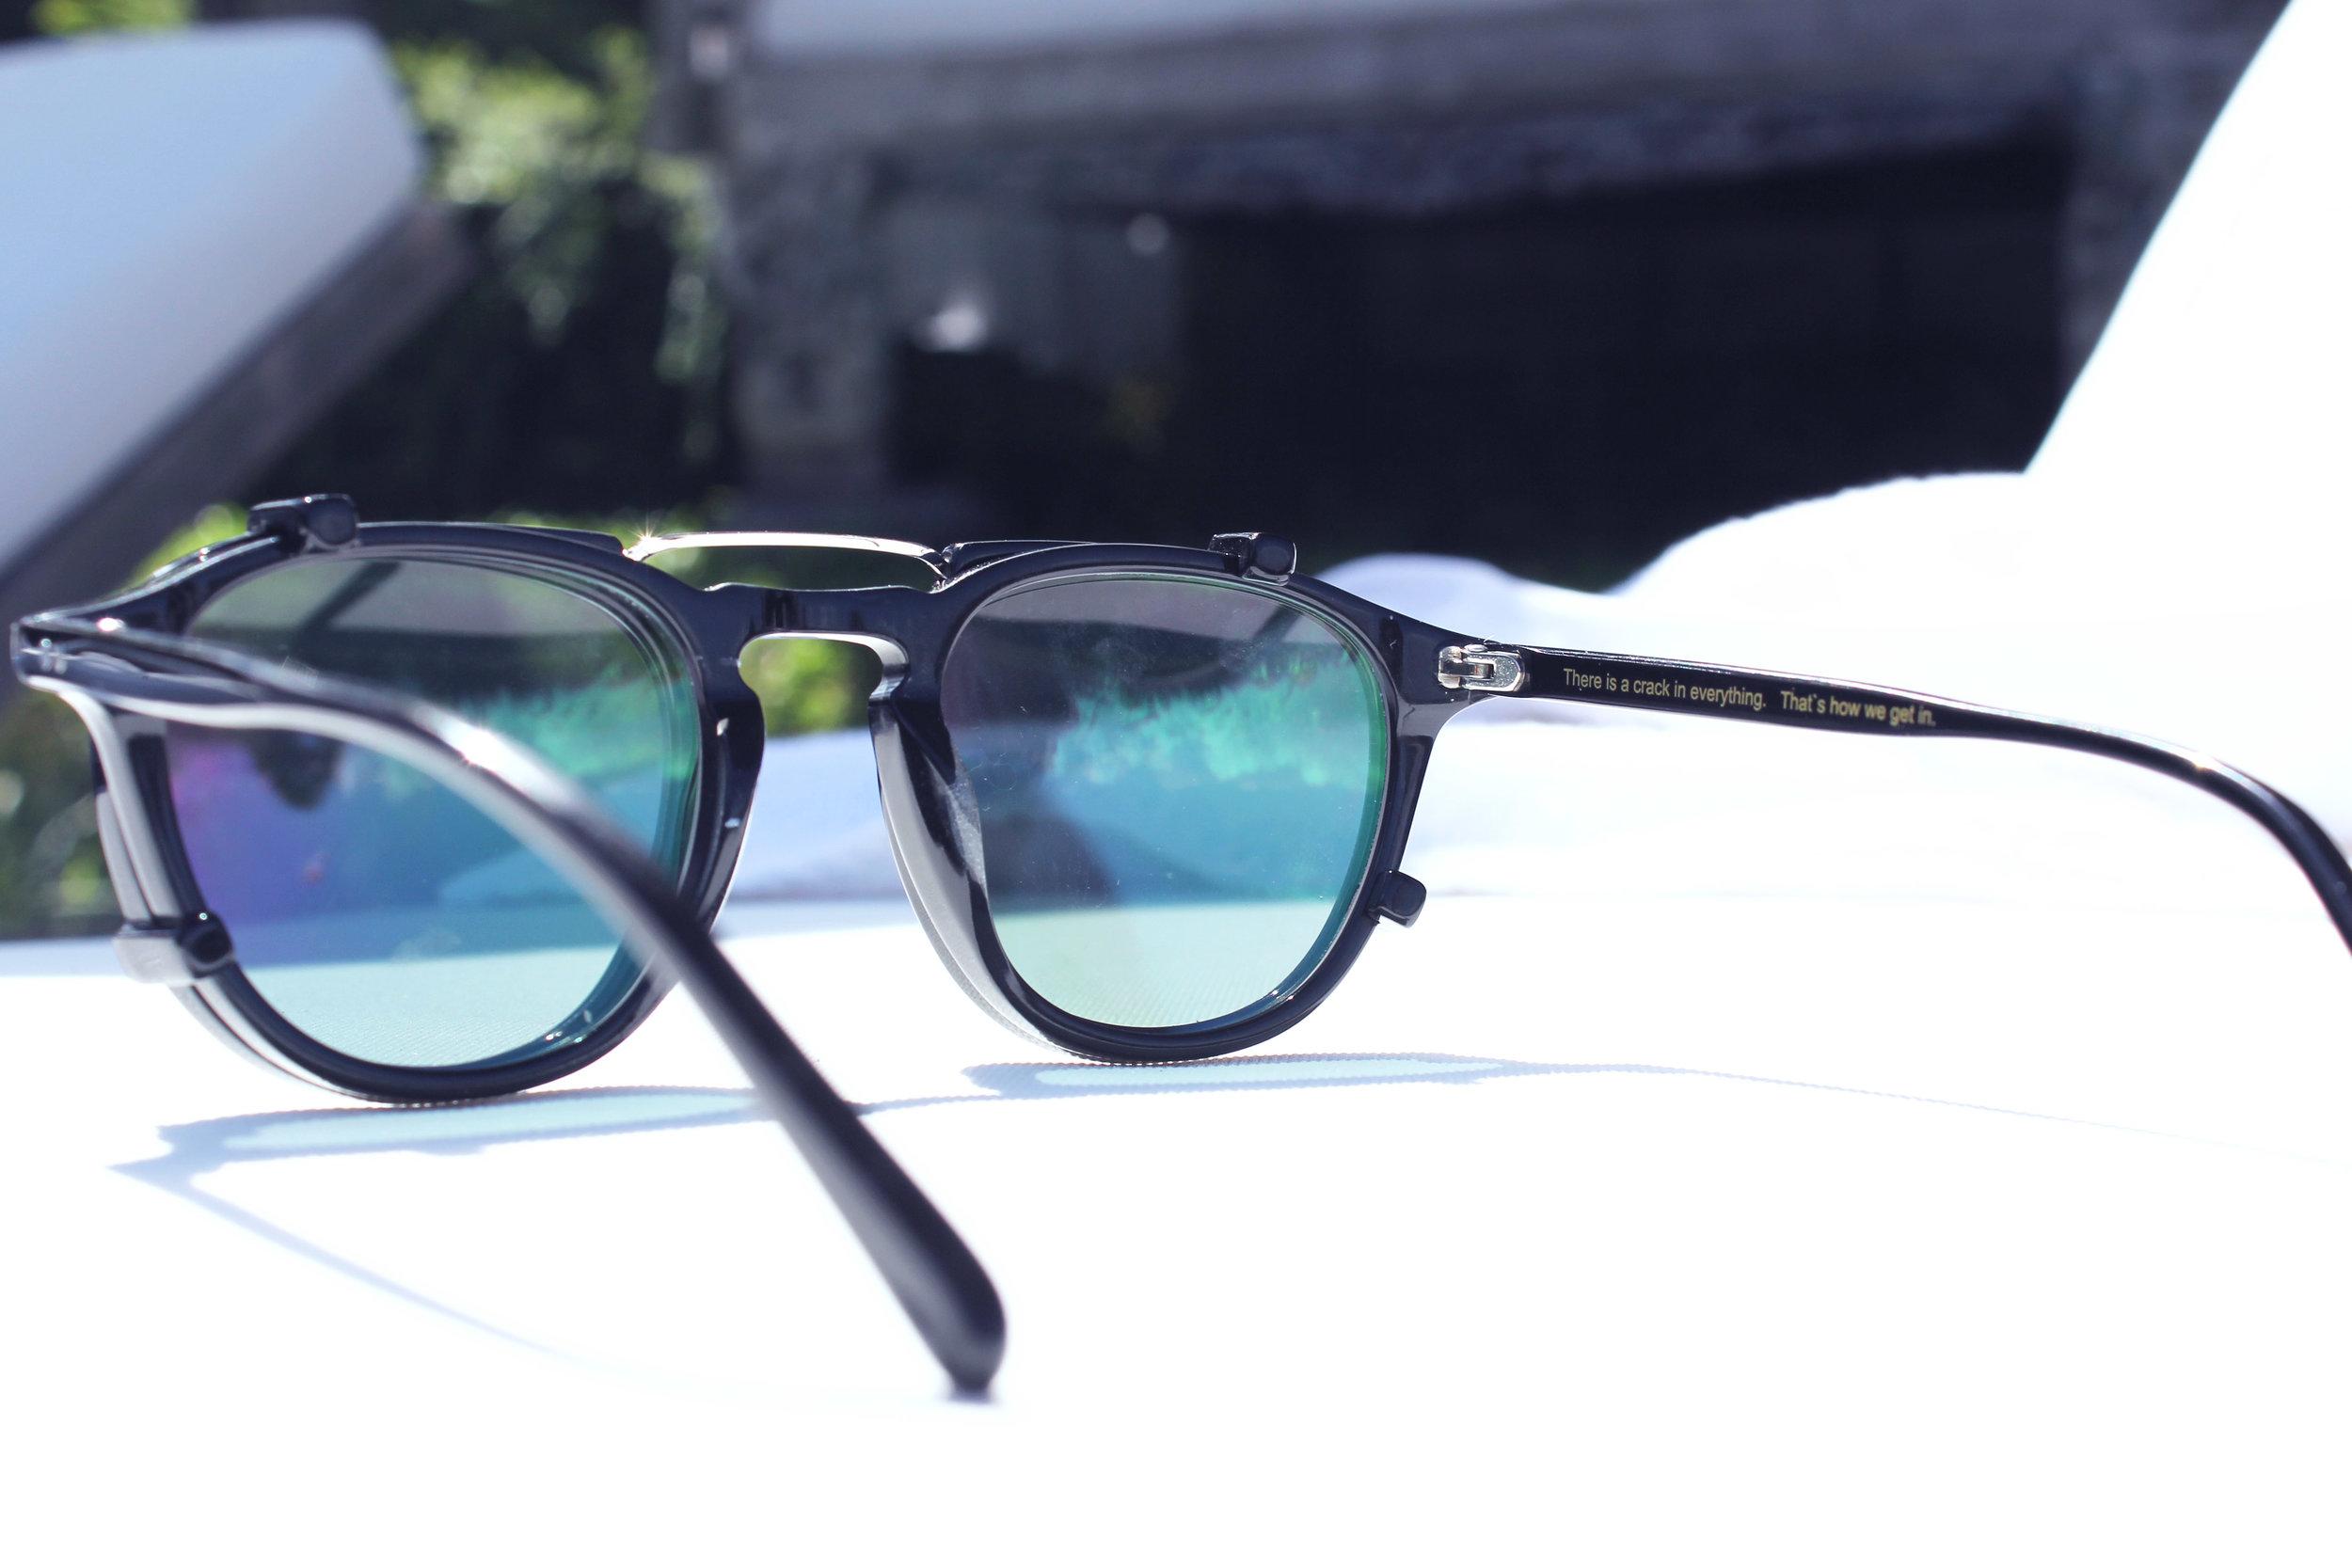 Raito Sunglasses Inside.jpg